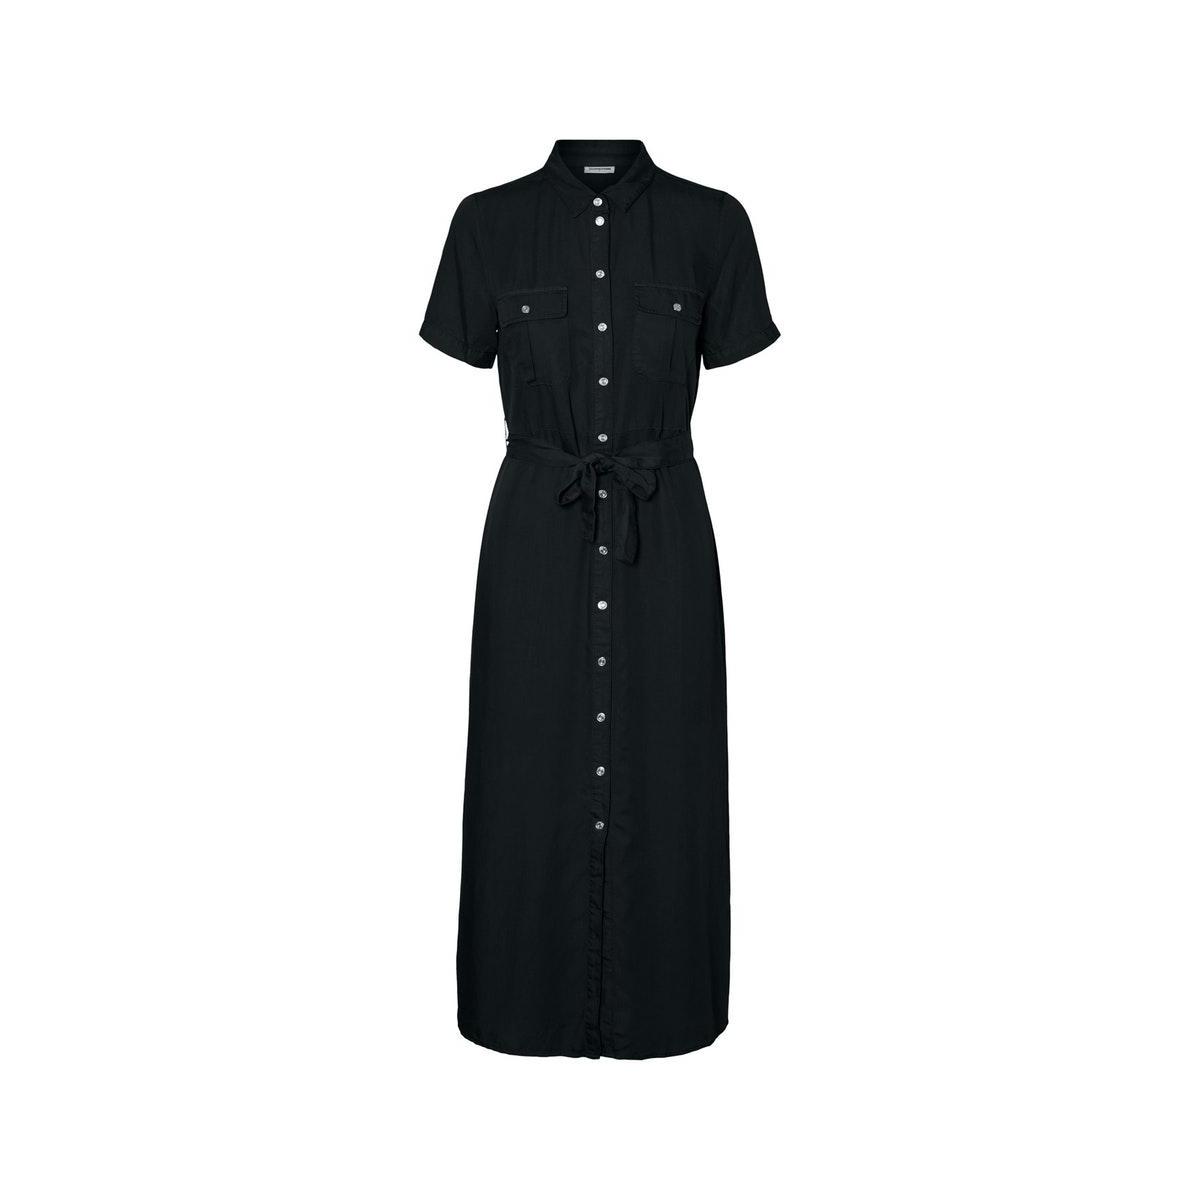 nmcersei s/s endi button dress bg 27011292 noisy may jurk black